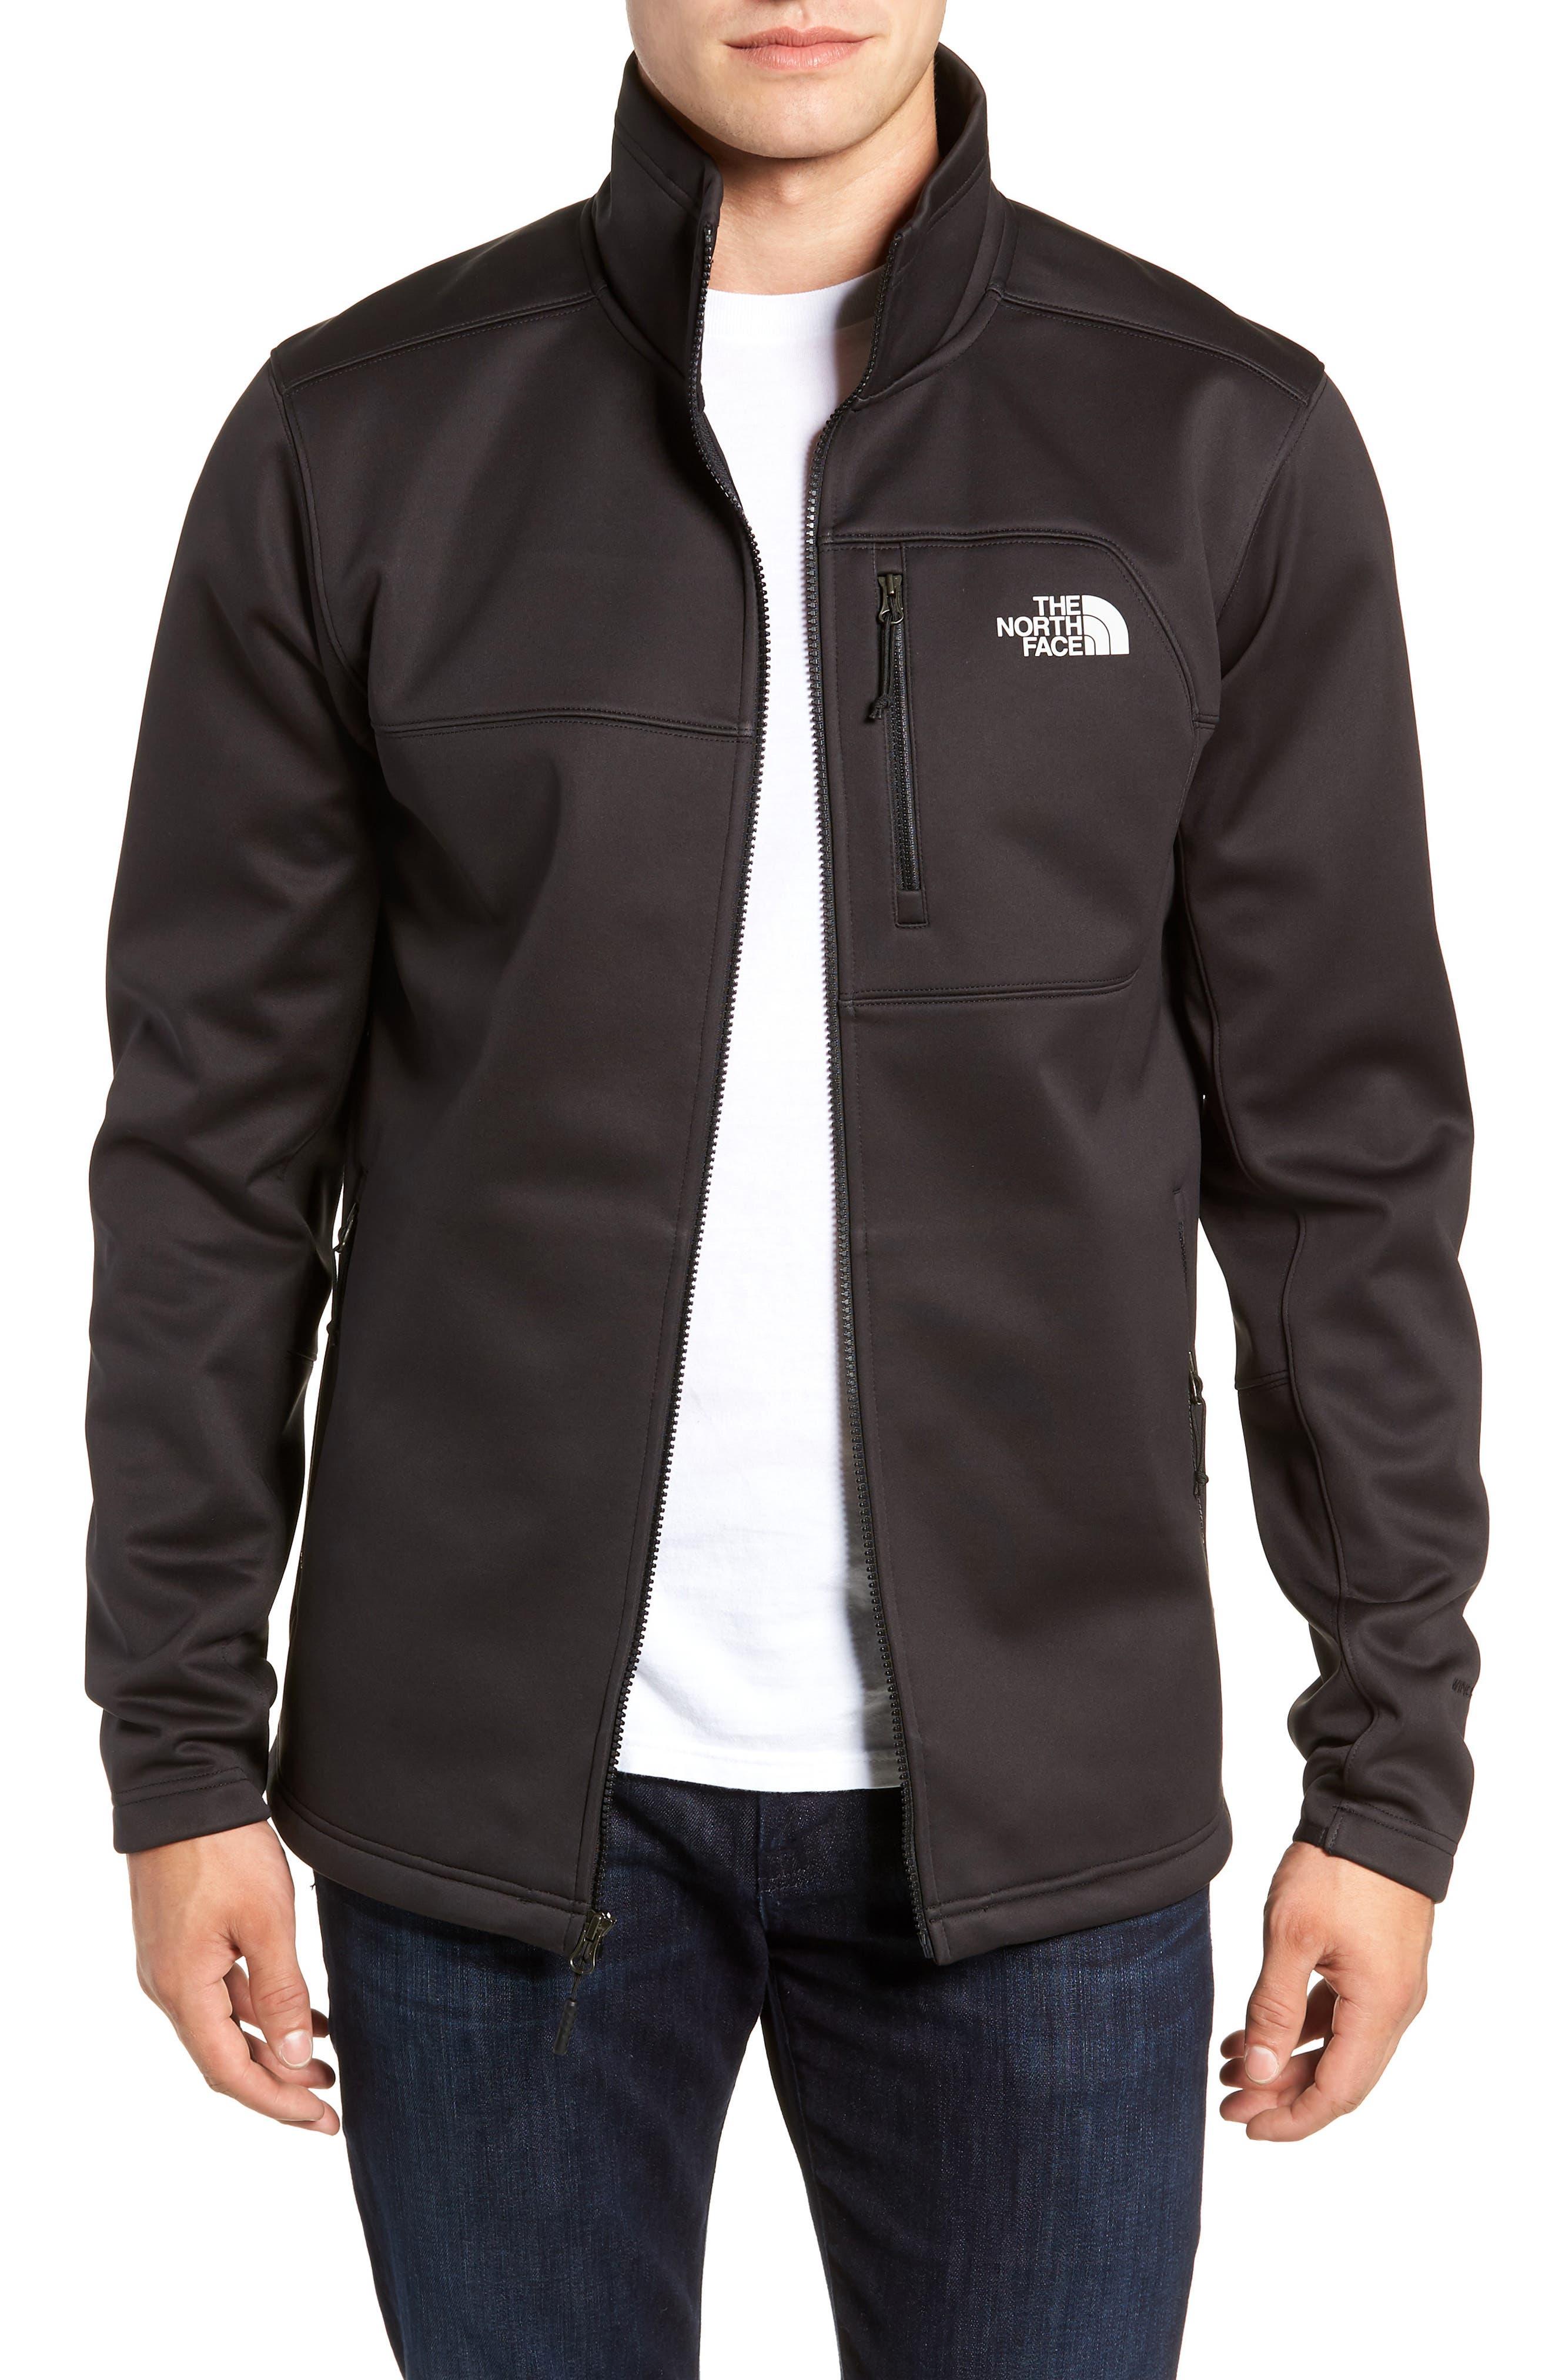 Apex Risor Jacket,                         Main,                         color, TNF BLACK/ TNF BLACK